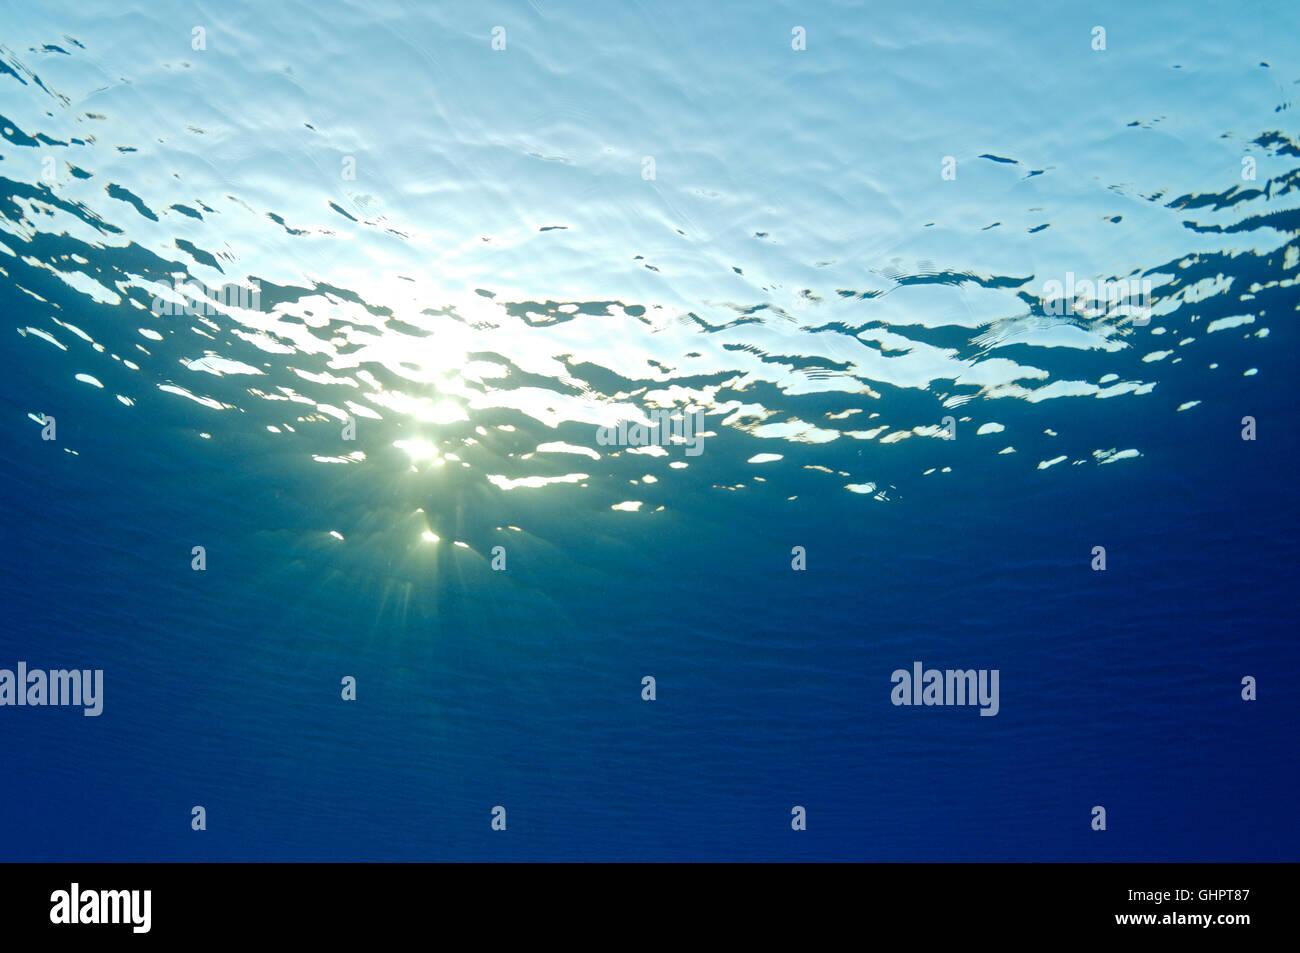 Acqua blu superficie subacquea frum con raggi solari, Mar Rosso, Egitto, Africa Immagini Stock